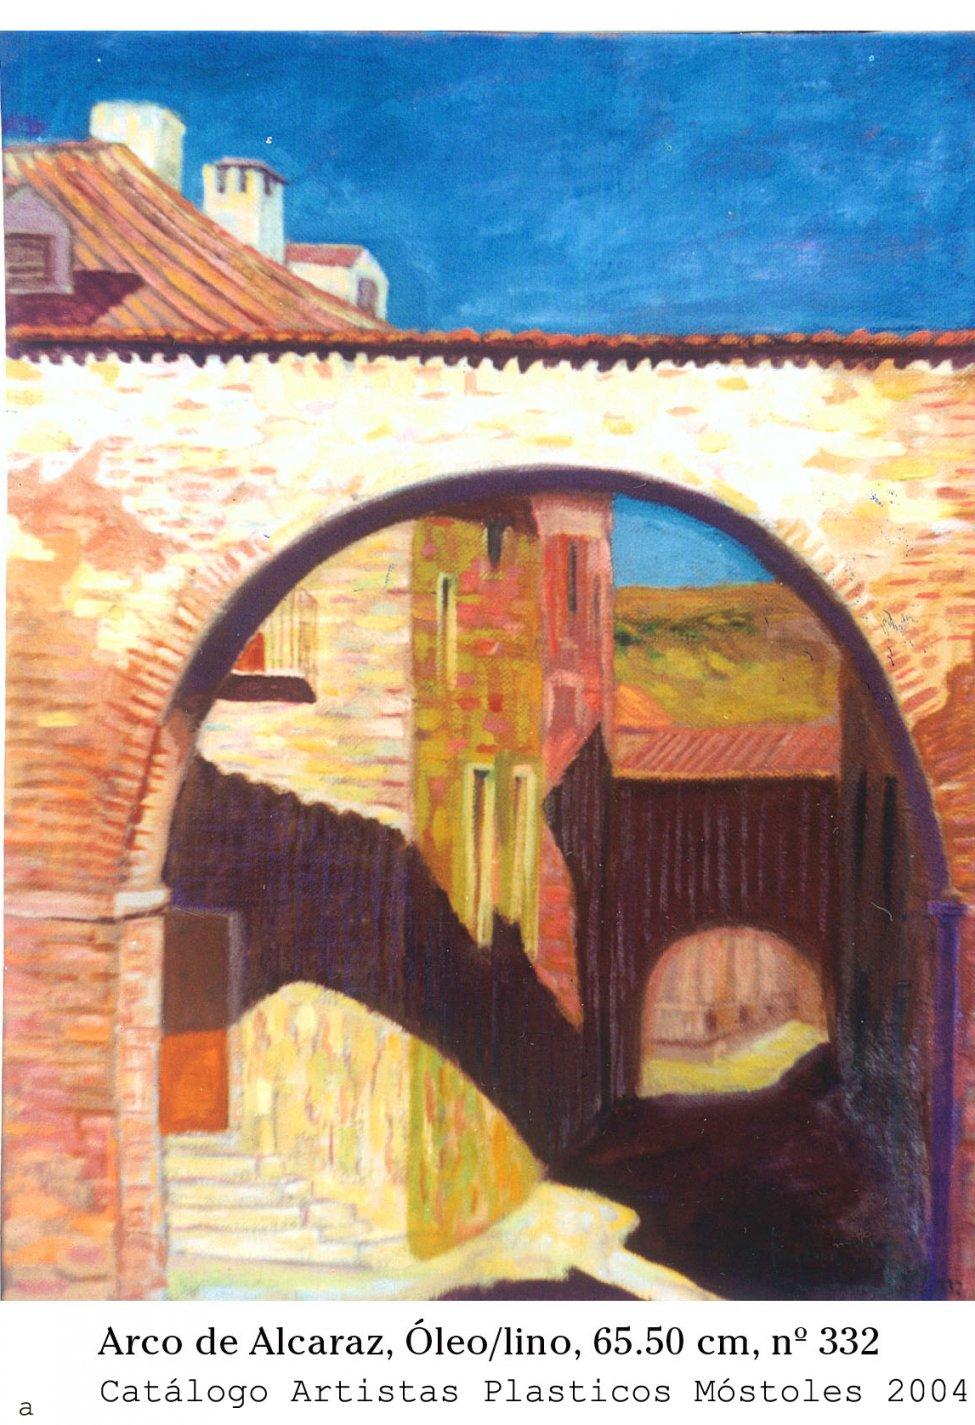 Arco de Alcaraz